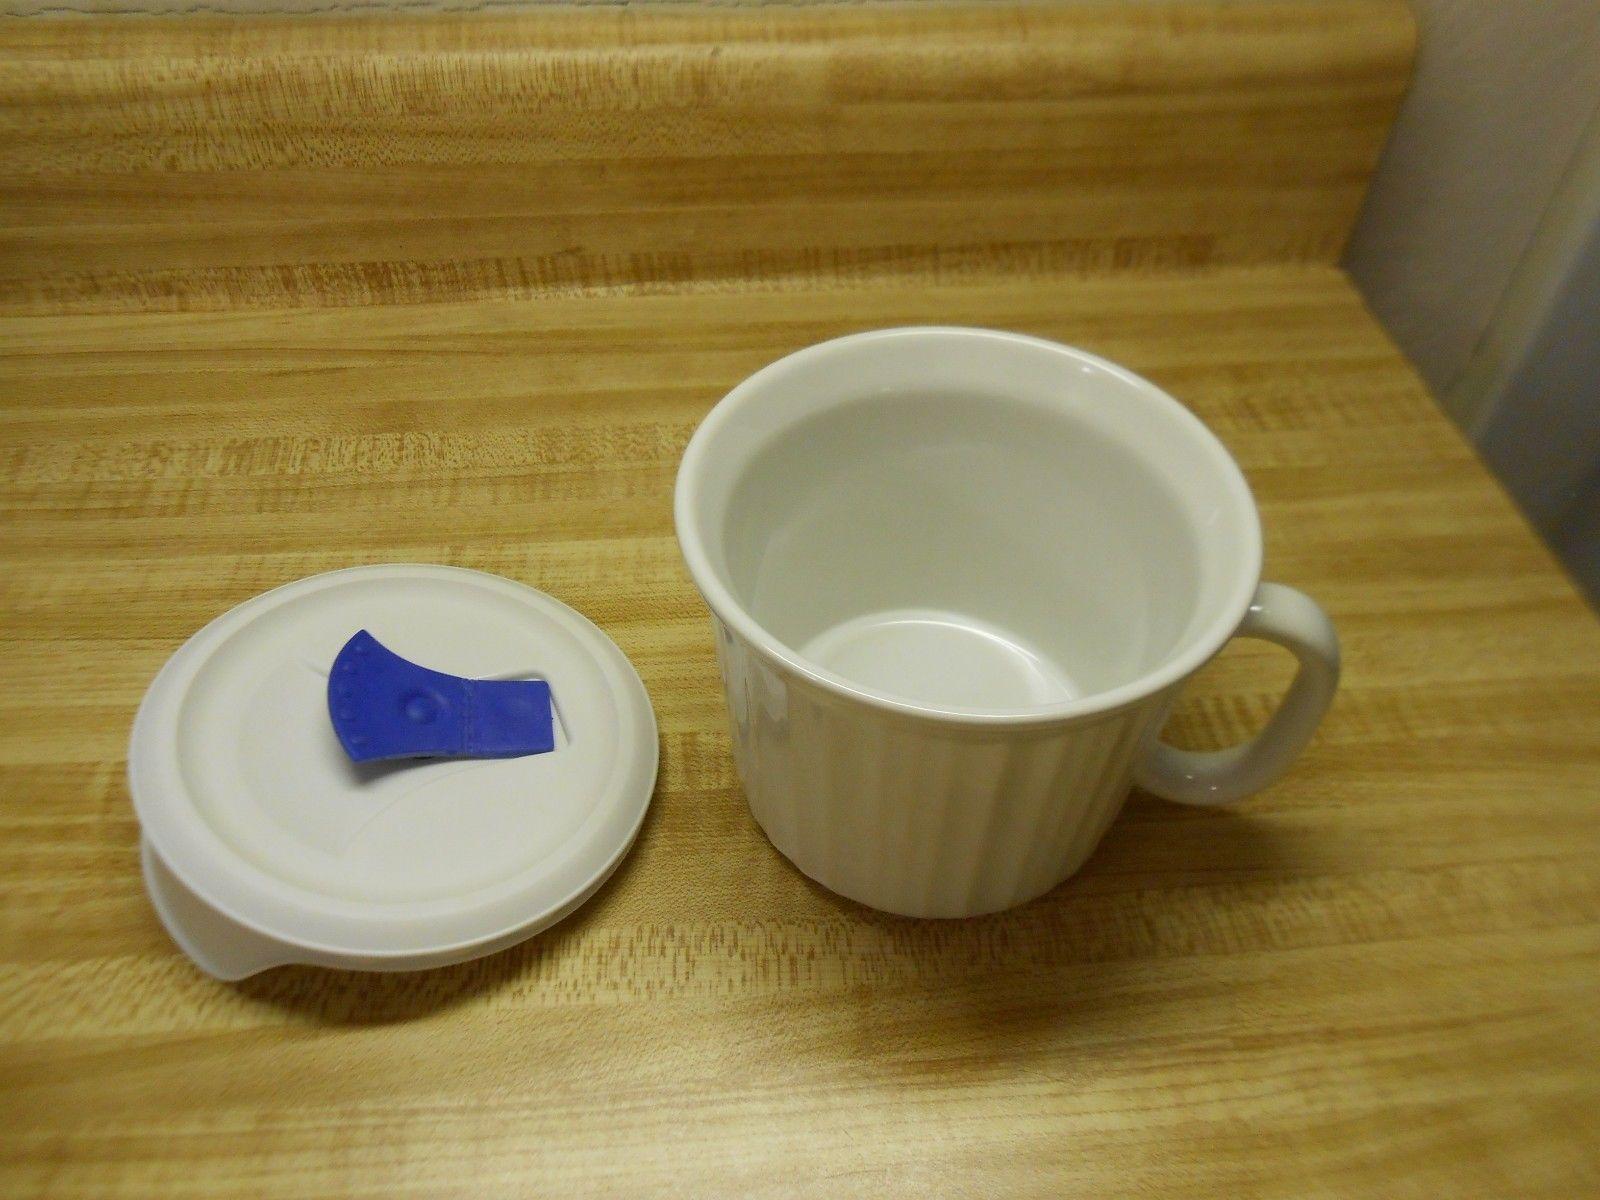 corning ware soup mug for microwave oven or regular oven too - $12.95